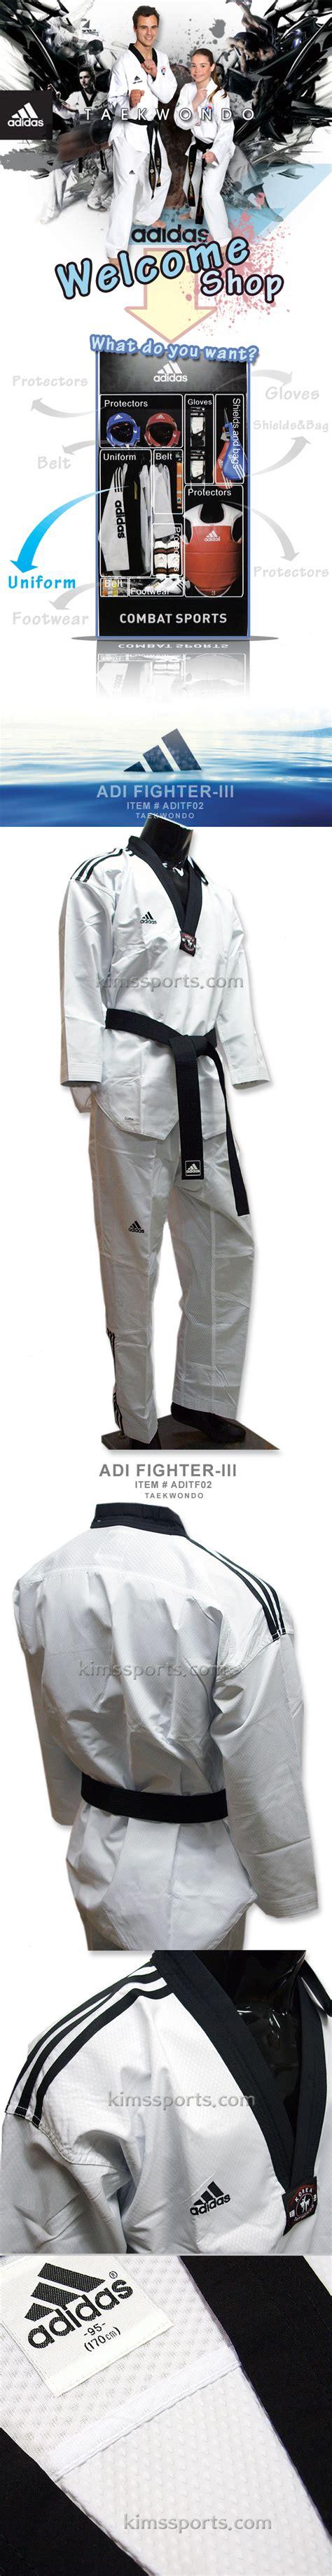 Dobok Adidas Fighter New Iii adidas adi fighter new 3 stripe taekwondo